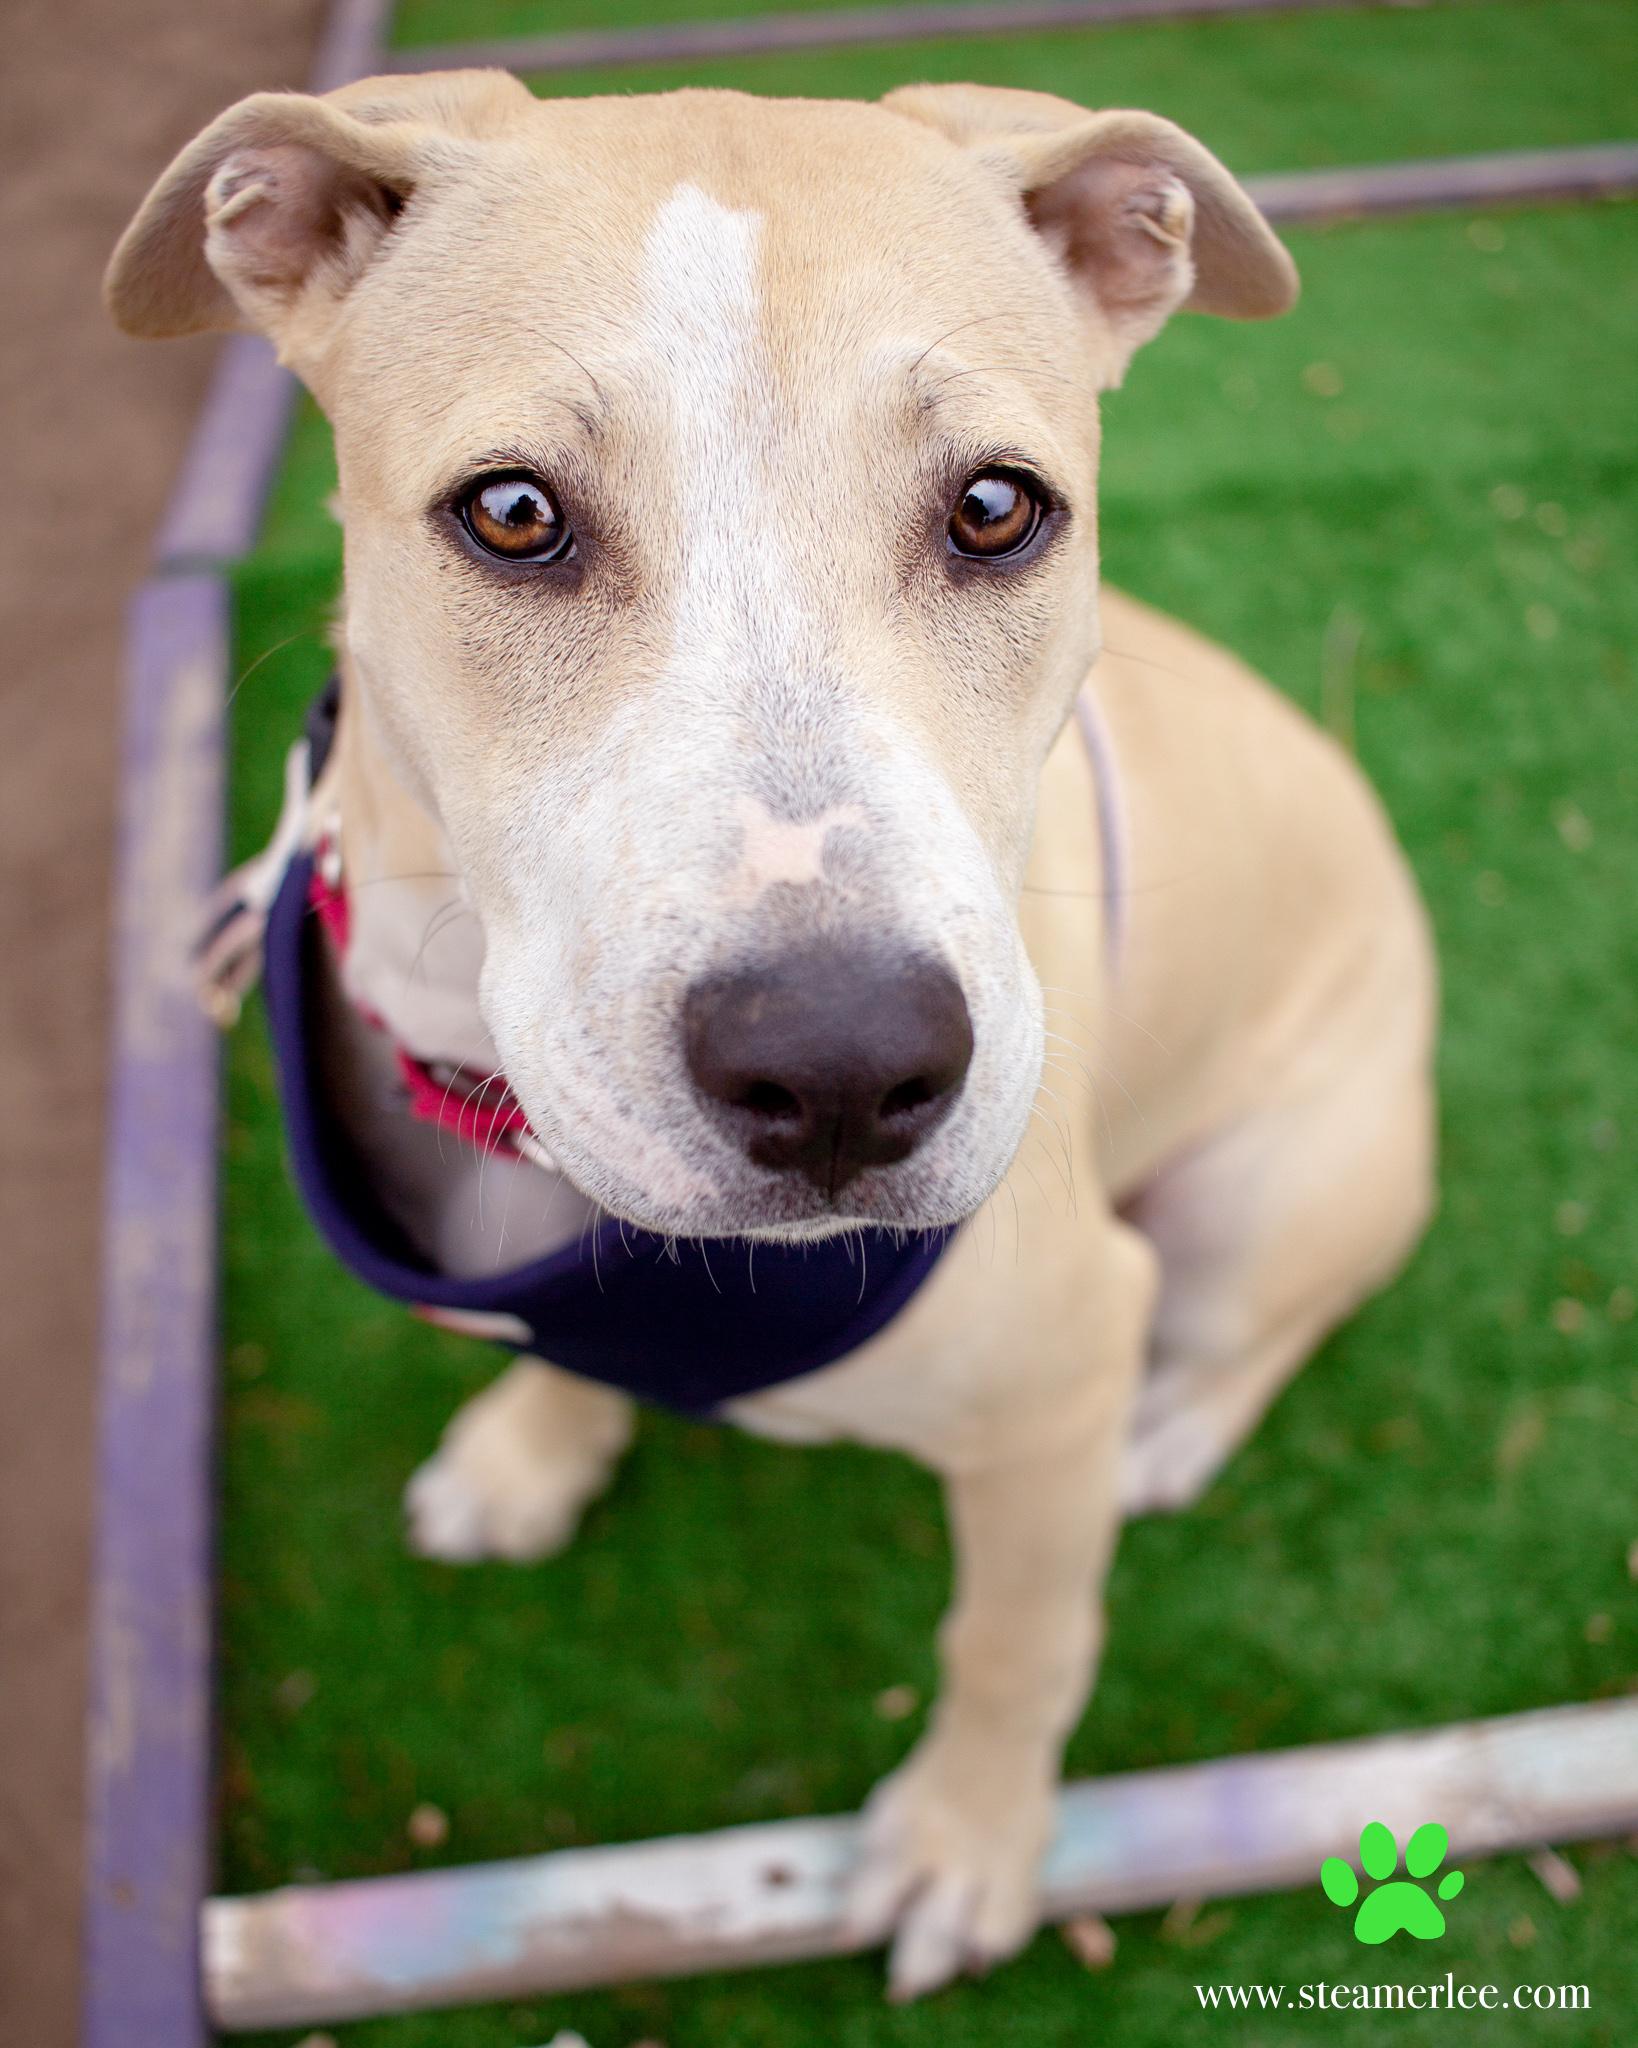 426-Orange-County-Dog-Photography-Steamer-Lee-Southern-California-SBACC.JPG